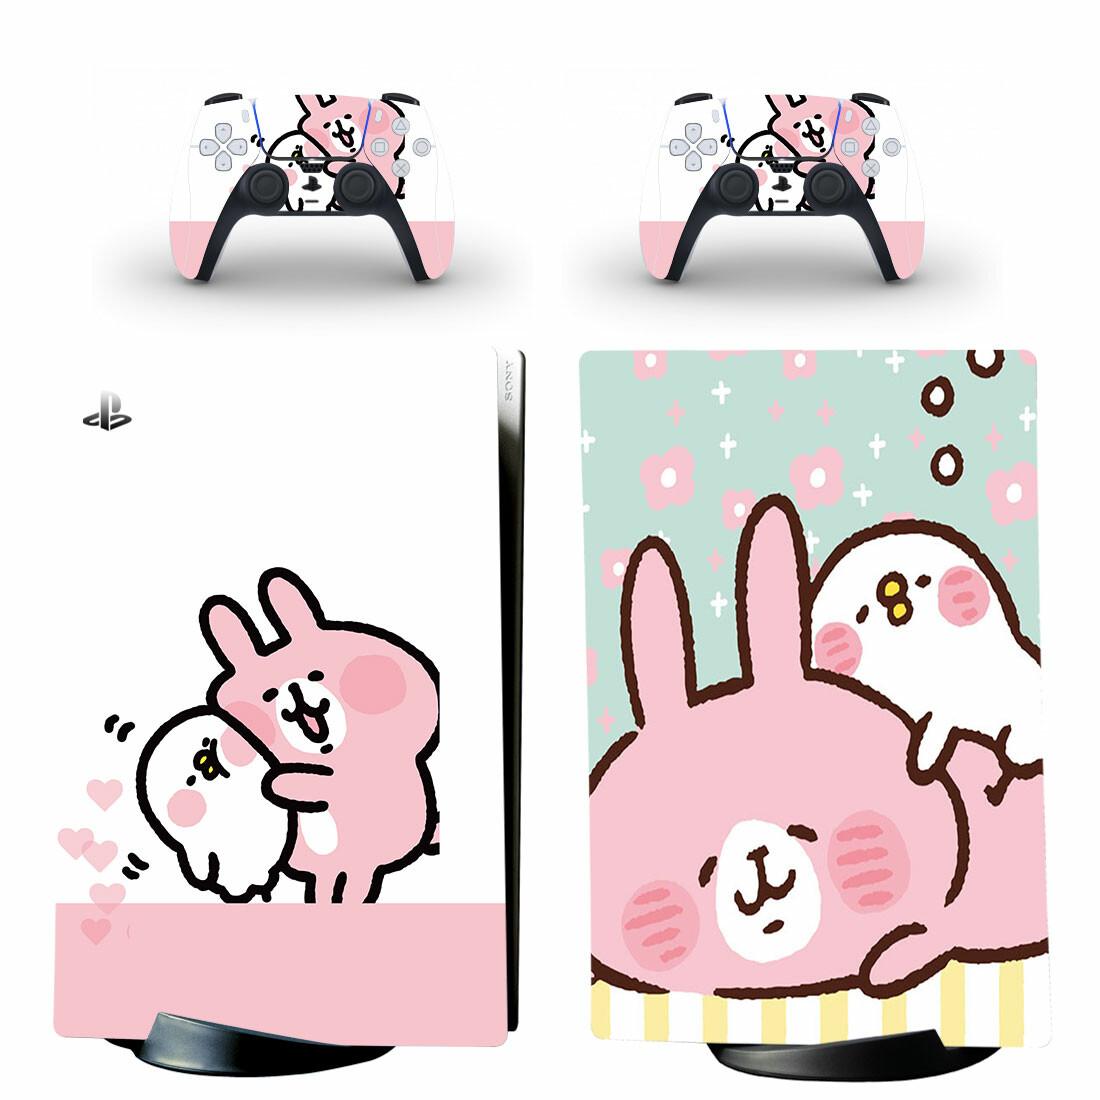 Kanahei PS5 Digital Edition Skin Sticker Decal Design 2